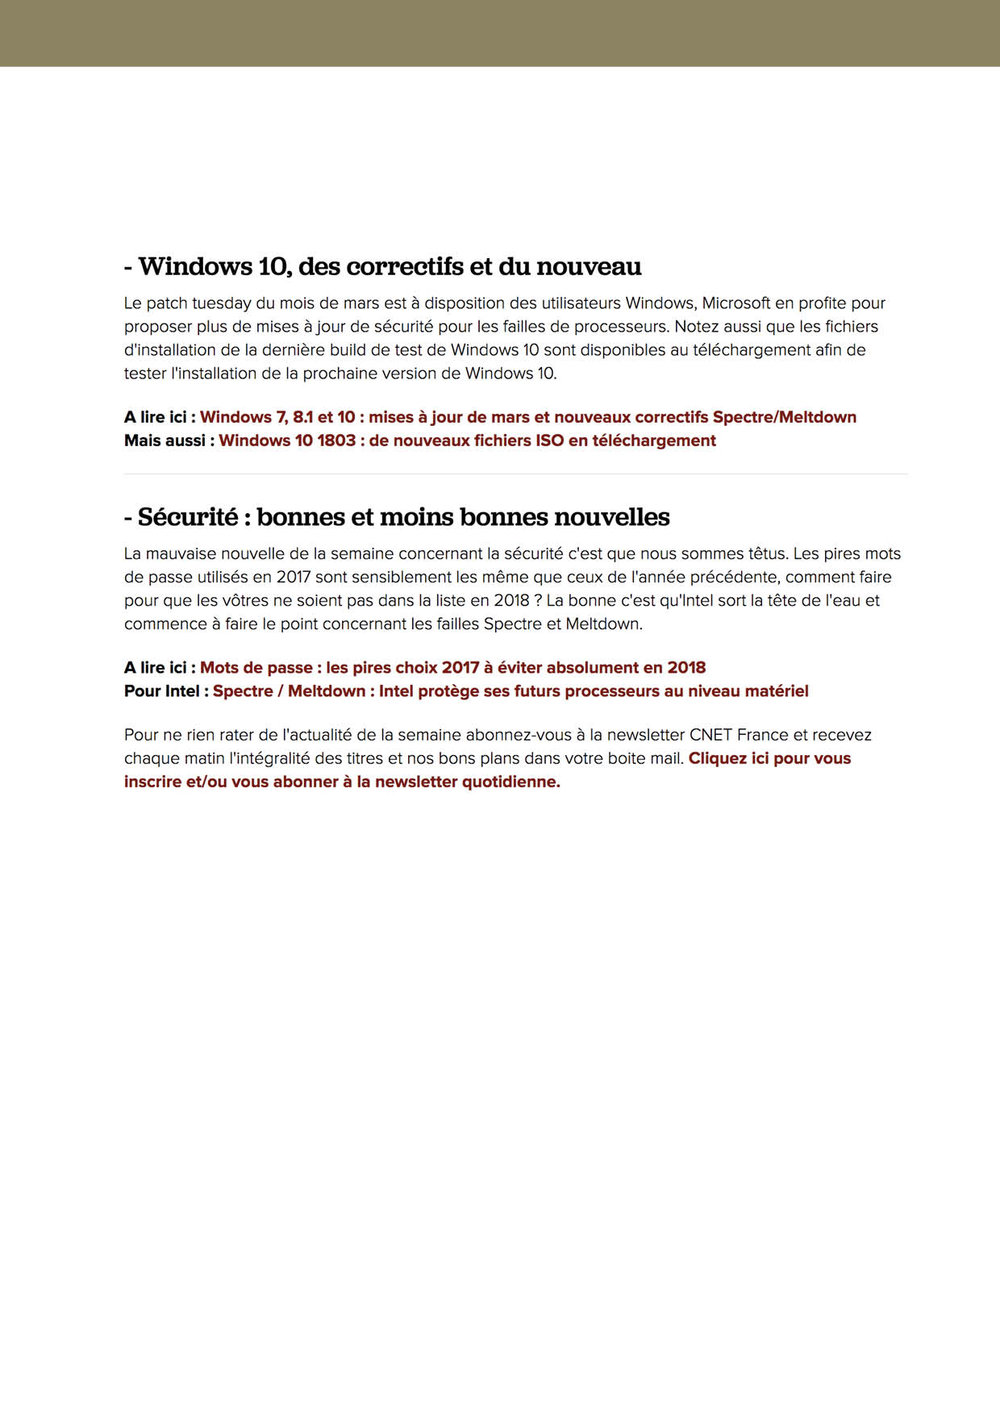 BOOKMEDIA_MAR31.jpg